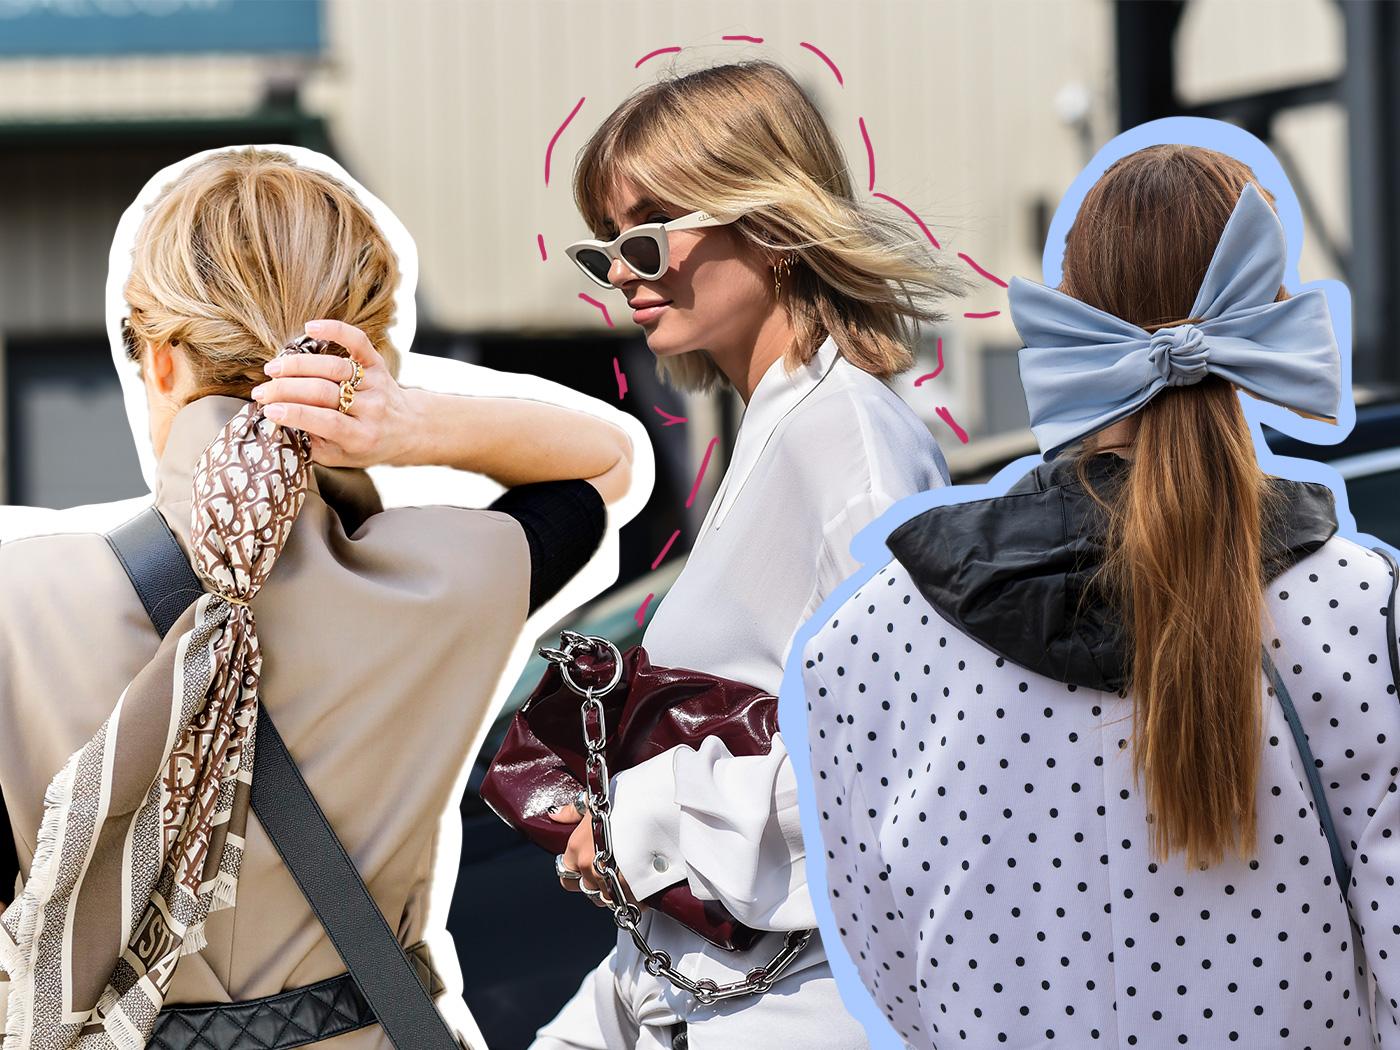 15 beauty looks που θα τους κάνουν να γυρίσουν το κεφάλι τους όταν περπατάς στο δρόμο!